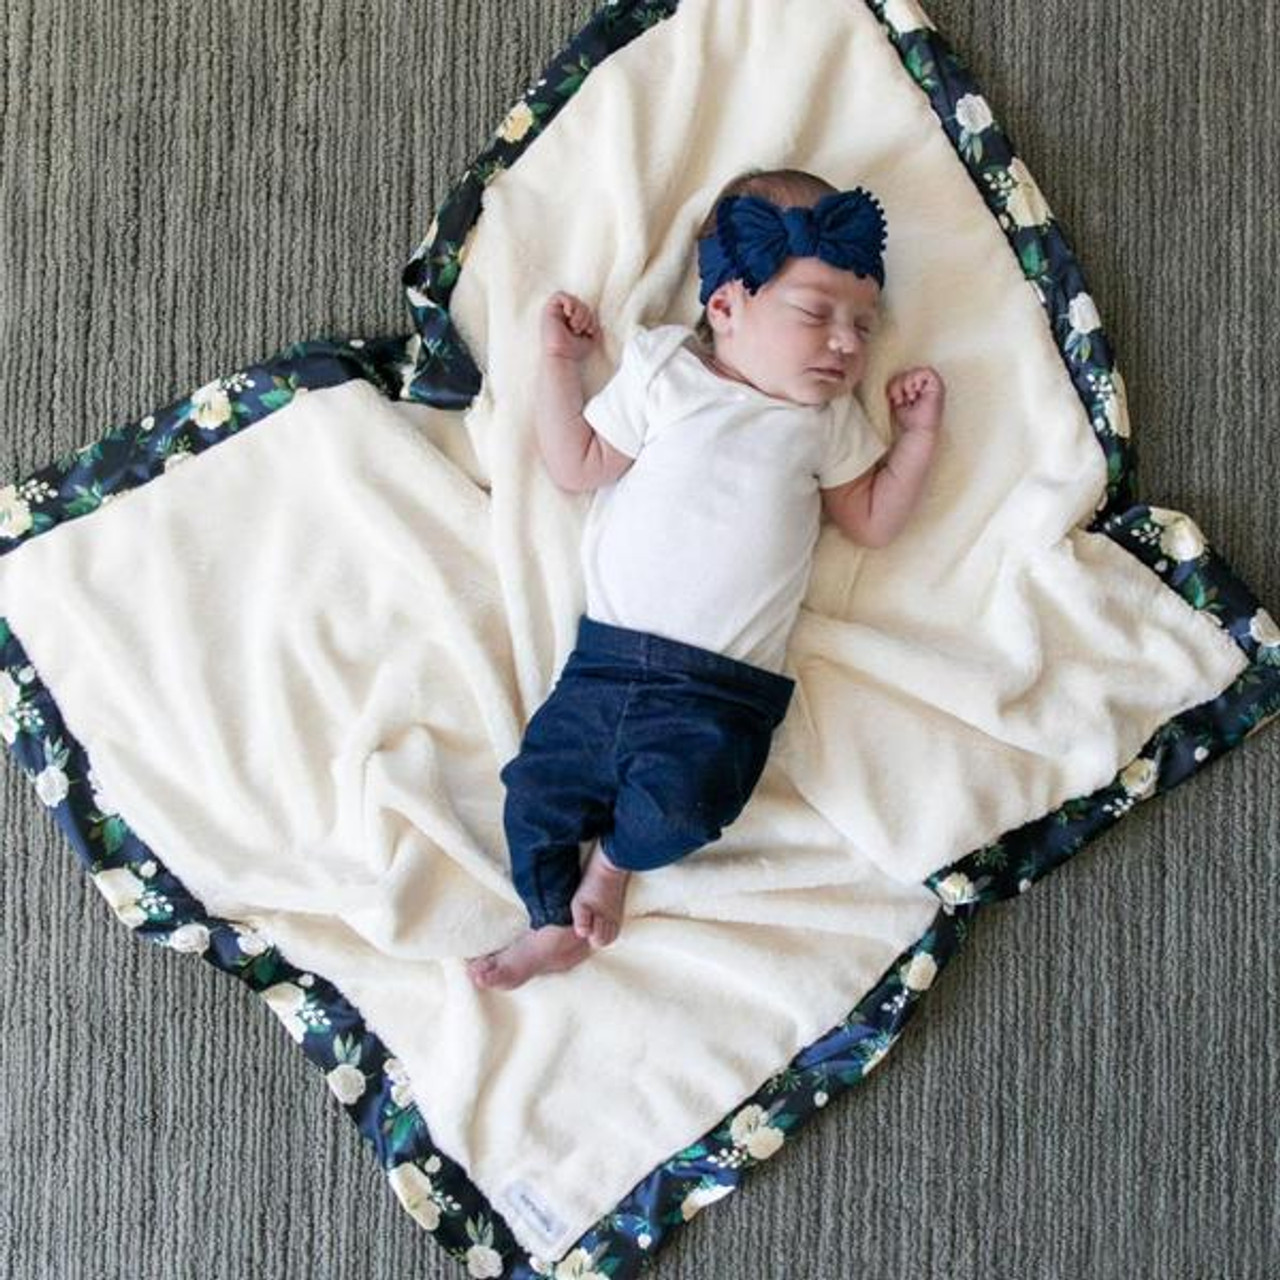 Gray Lush Navy Twinkle Star Satin Border, Receiving Blanket 30 x 40 Saranoni Satin Border Receiving Blankets for Babies Super Soft Lush Luxury Baby Blanket